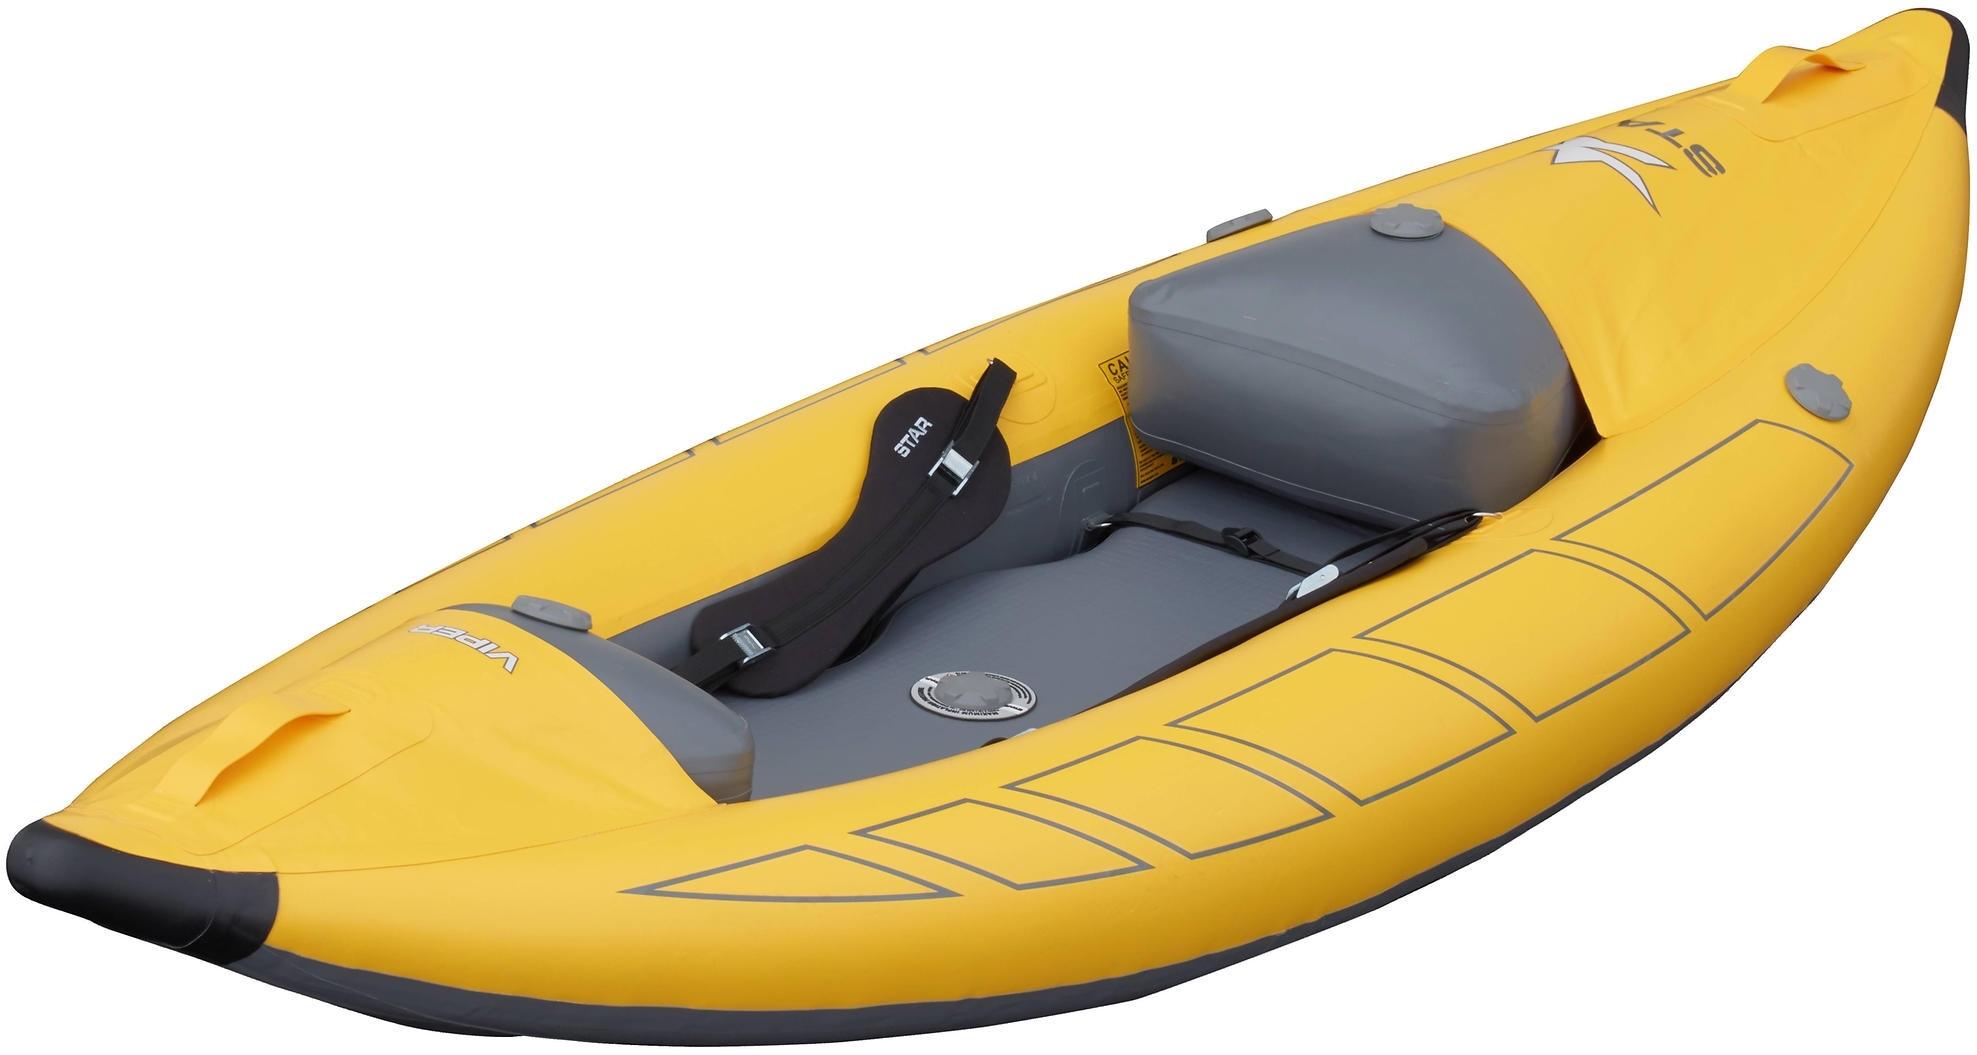 NRS STAR Viper Inflatable Kayak 9'6